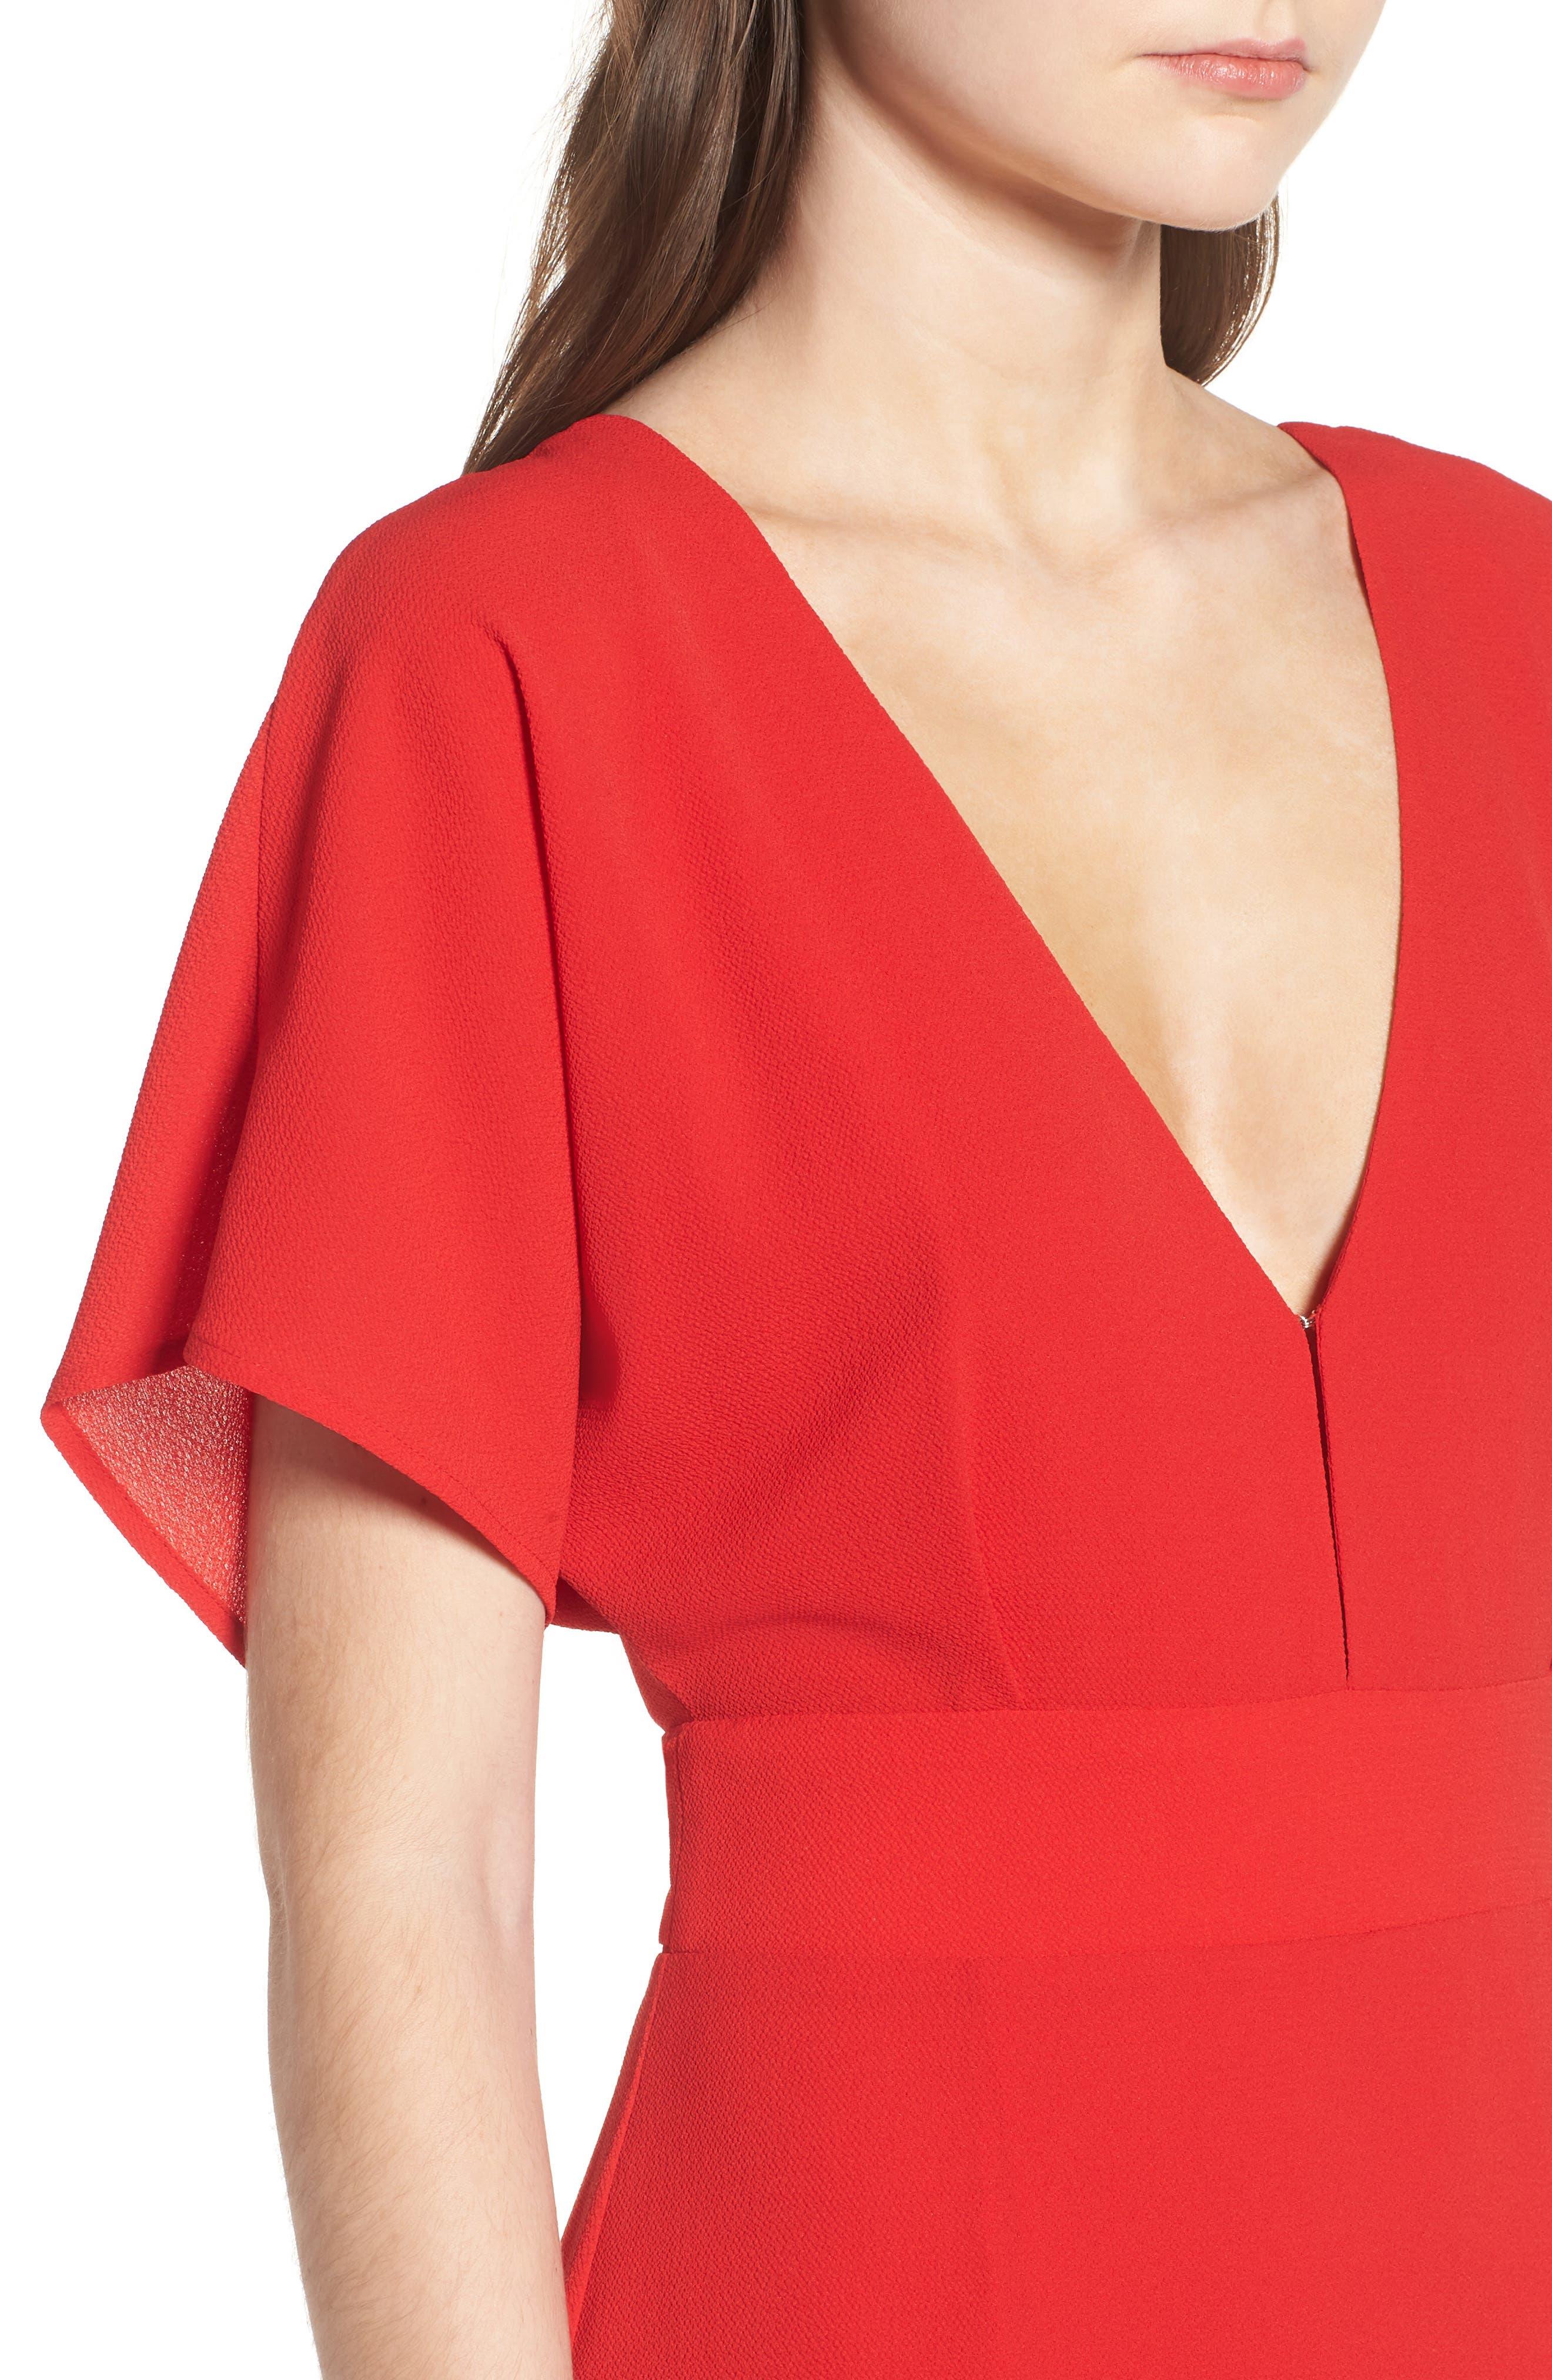 Carrara Slit Maxi Dress,                             Alternate thumbnail 8, color,